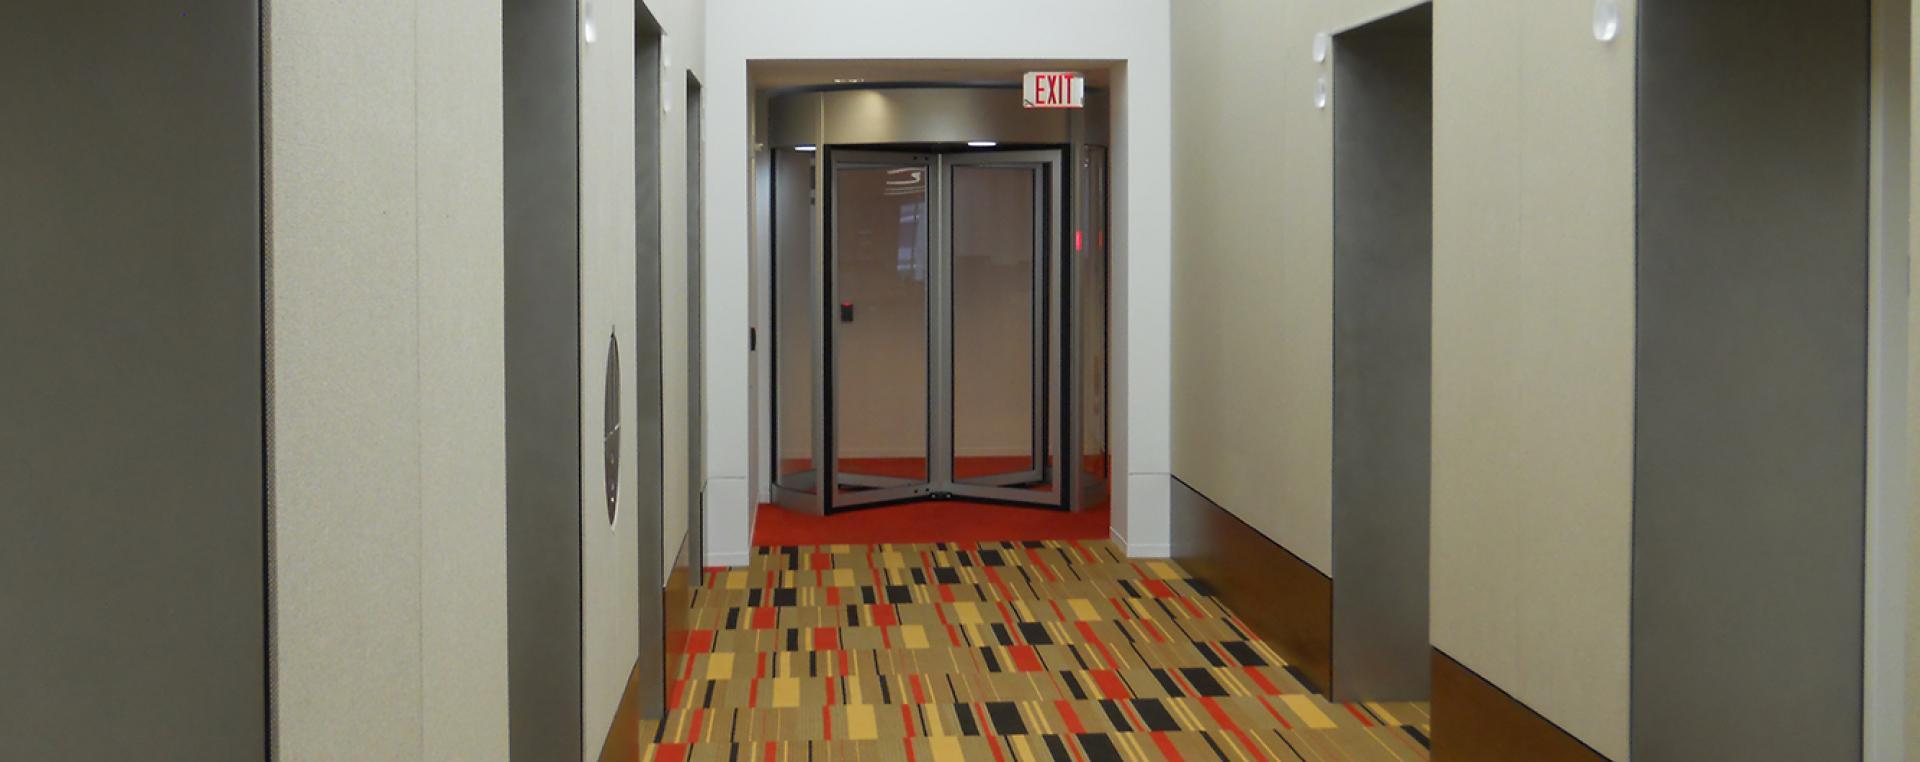 Building Security Entrances